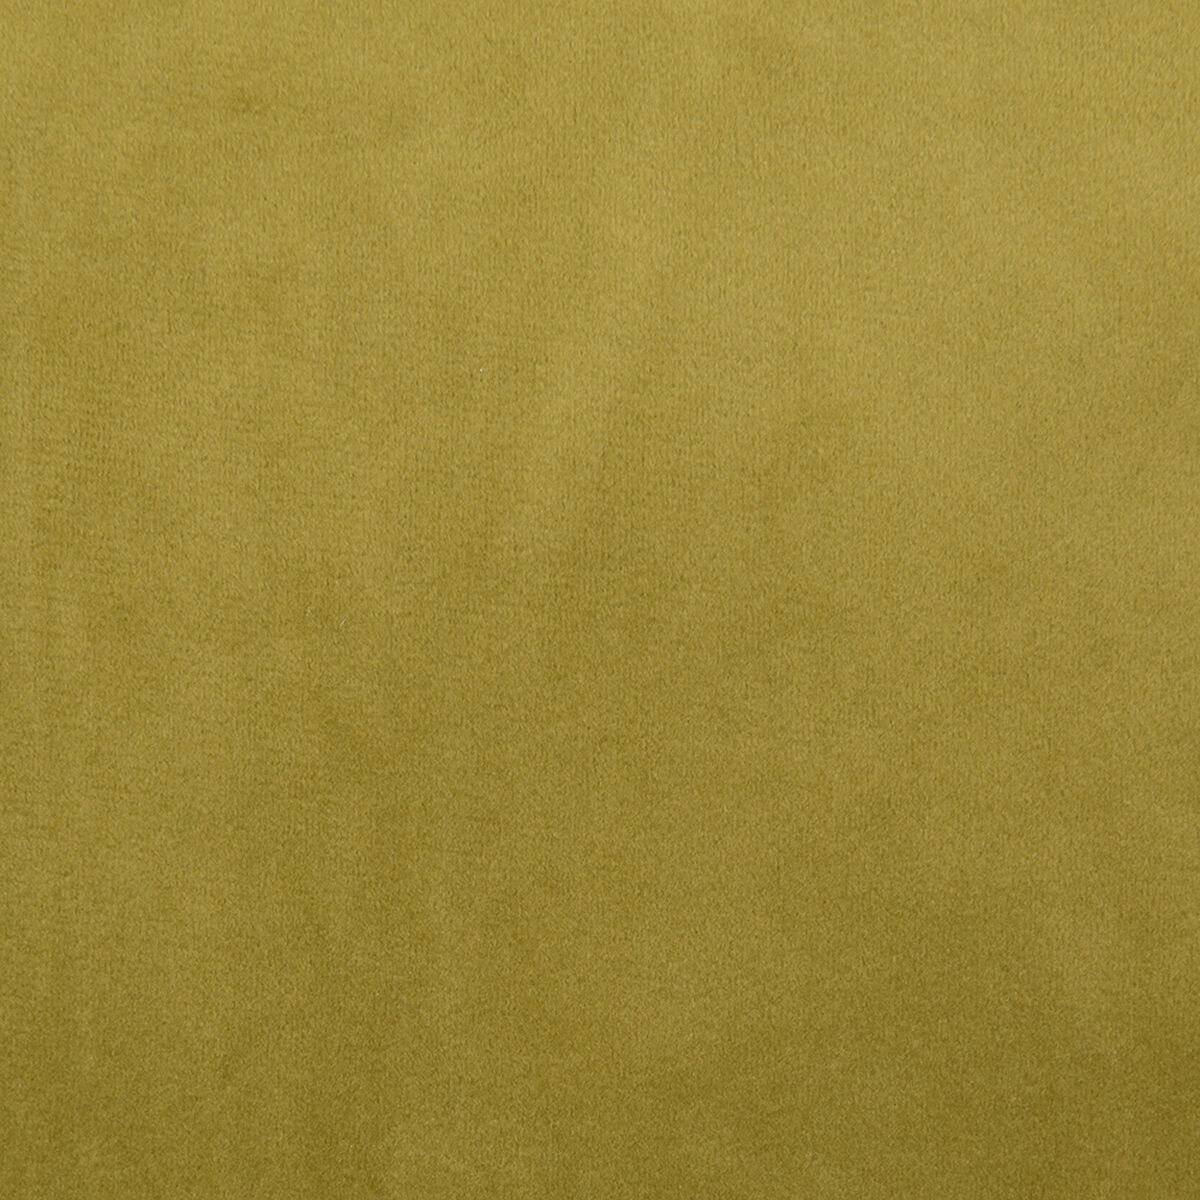 Cojín Velvet Sohome by Fabrics Pompones Amarillo 45 x 45 cm